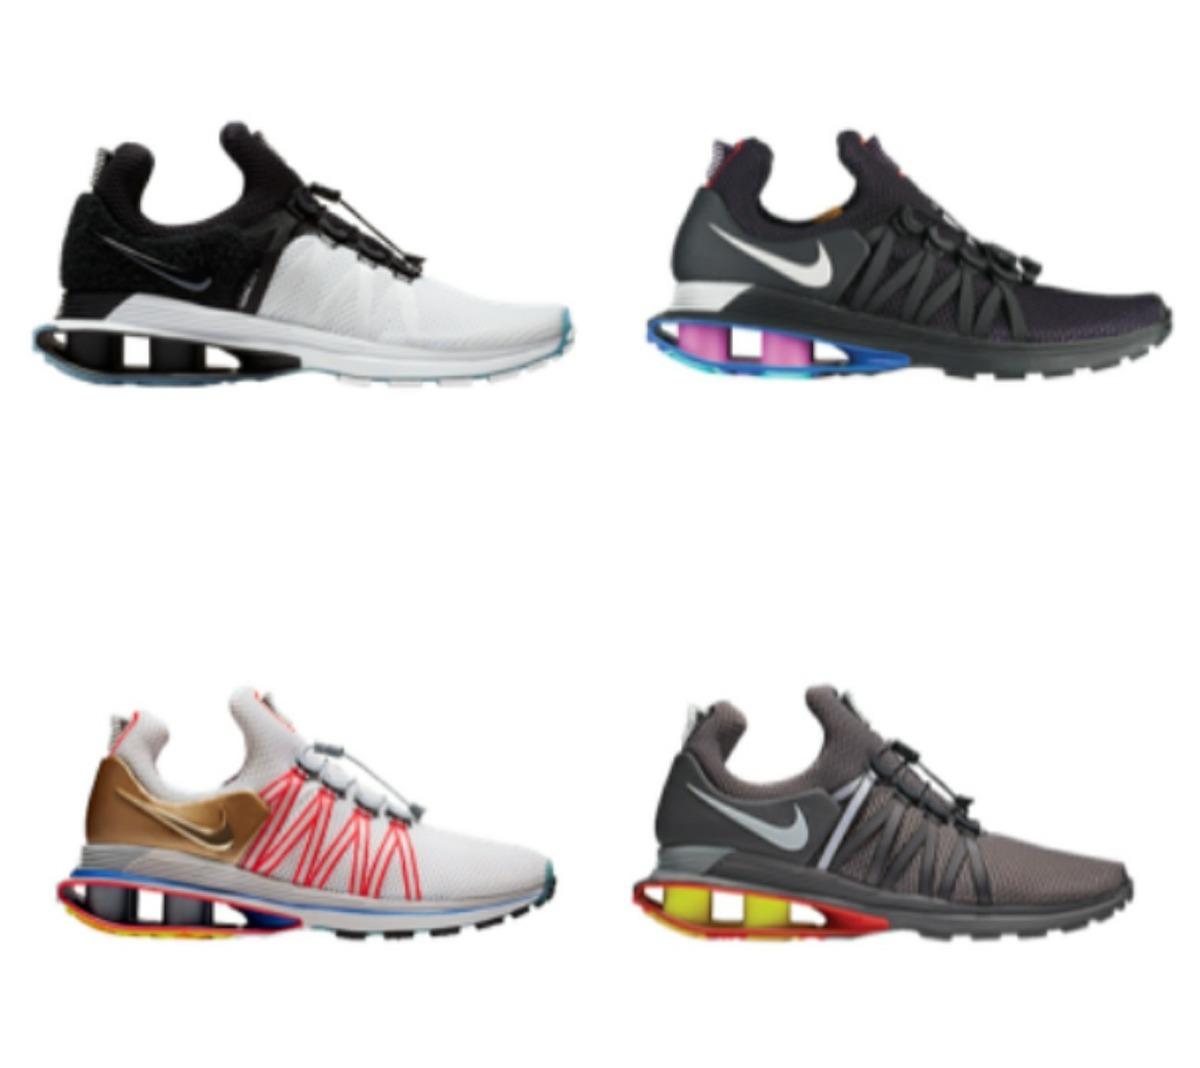 6c05284f695 Nike Shox Gravity